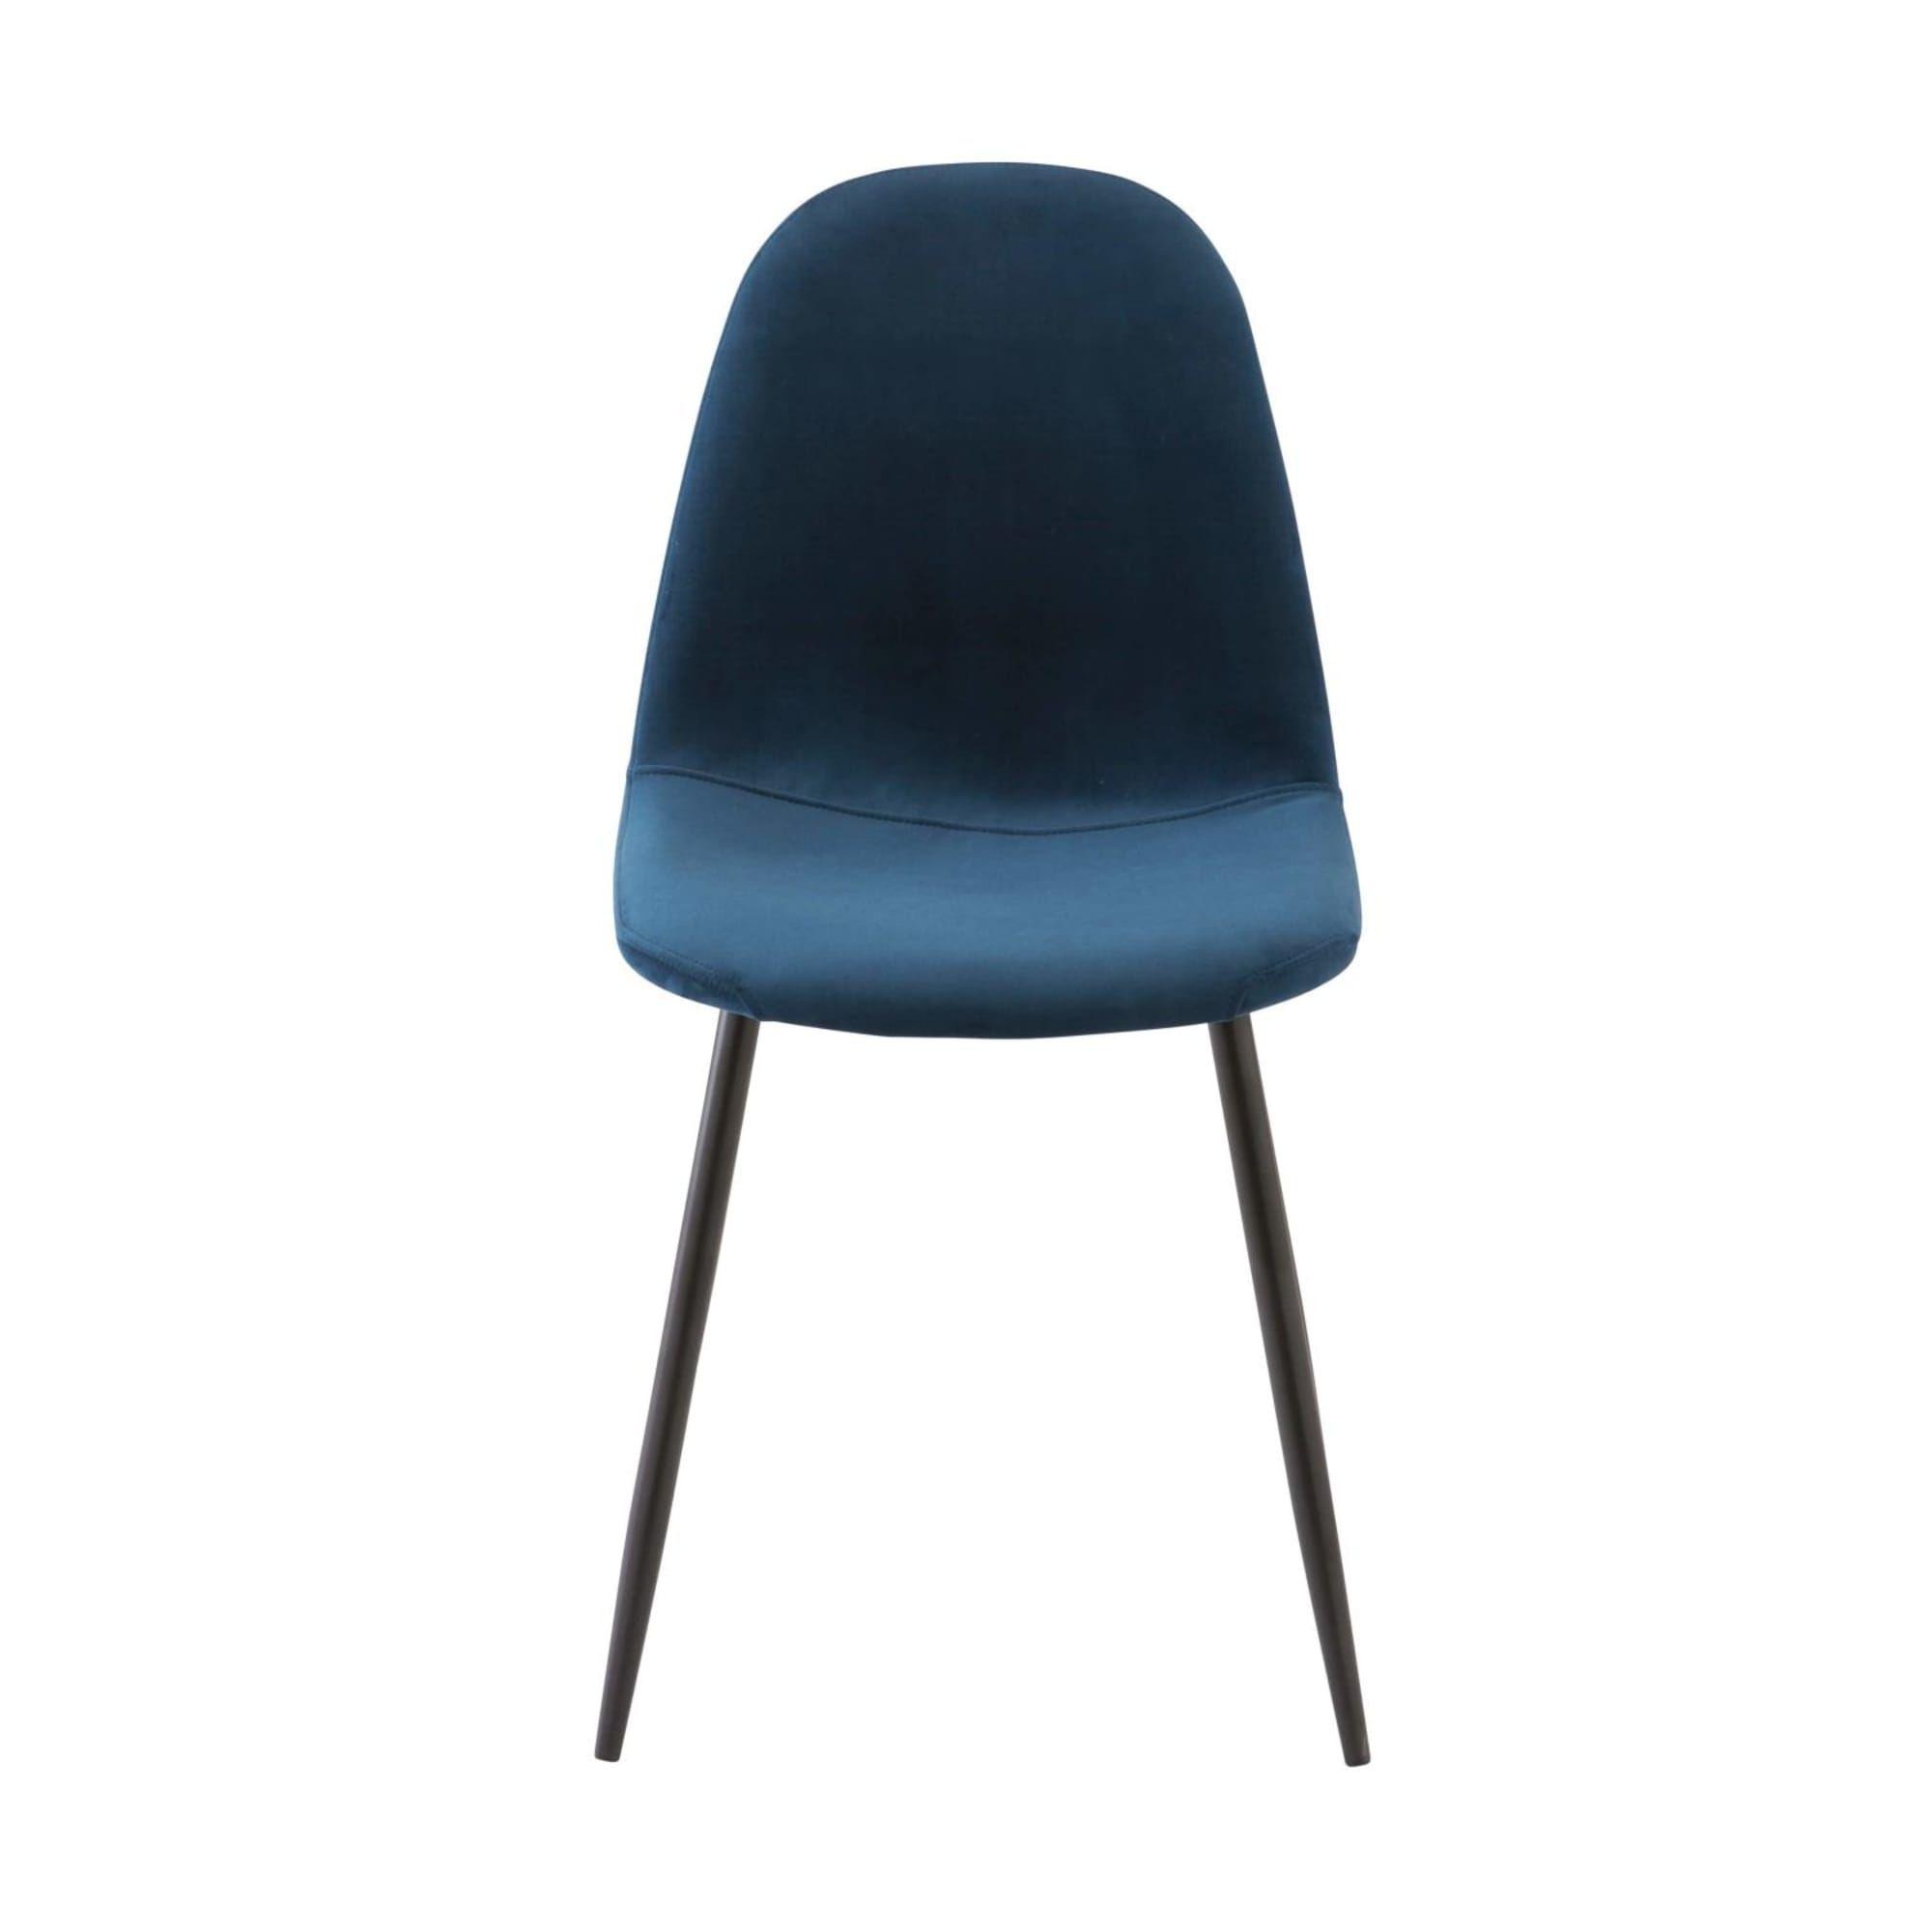 Chaise Style Scandinave En Velours Bleu Chaise Style Scandinave Velours Bleu Salle A Manger Bleue